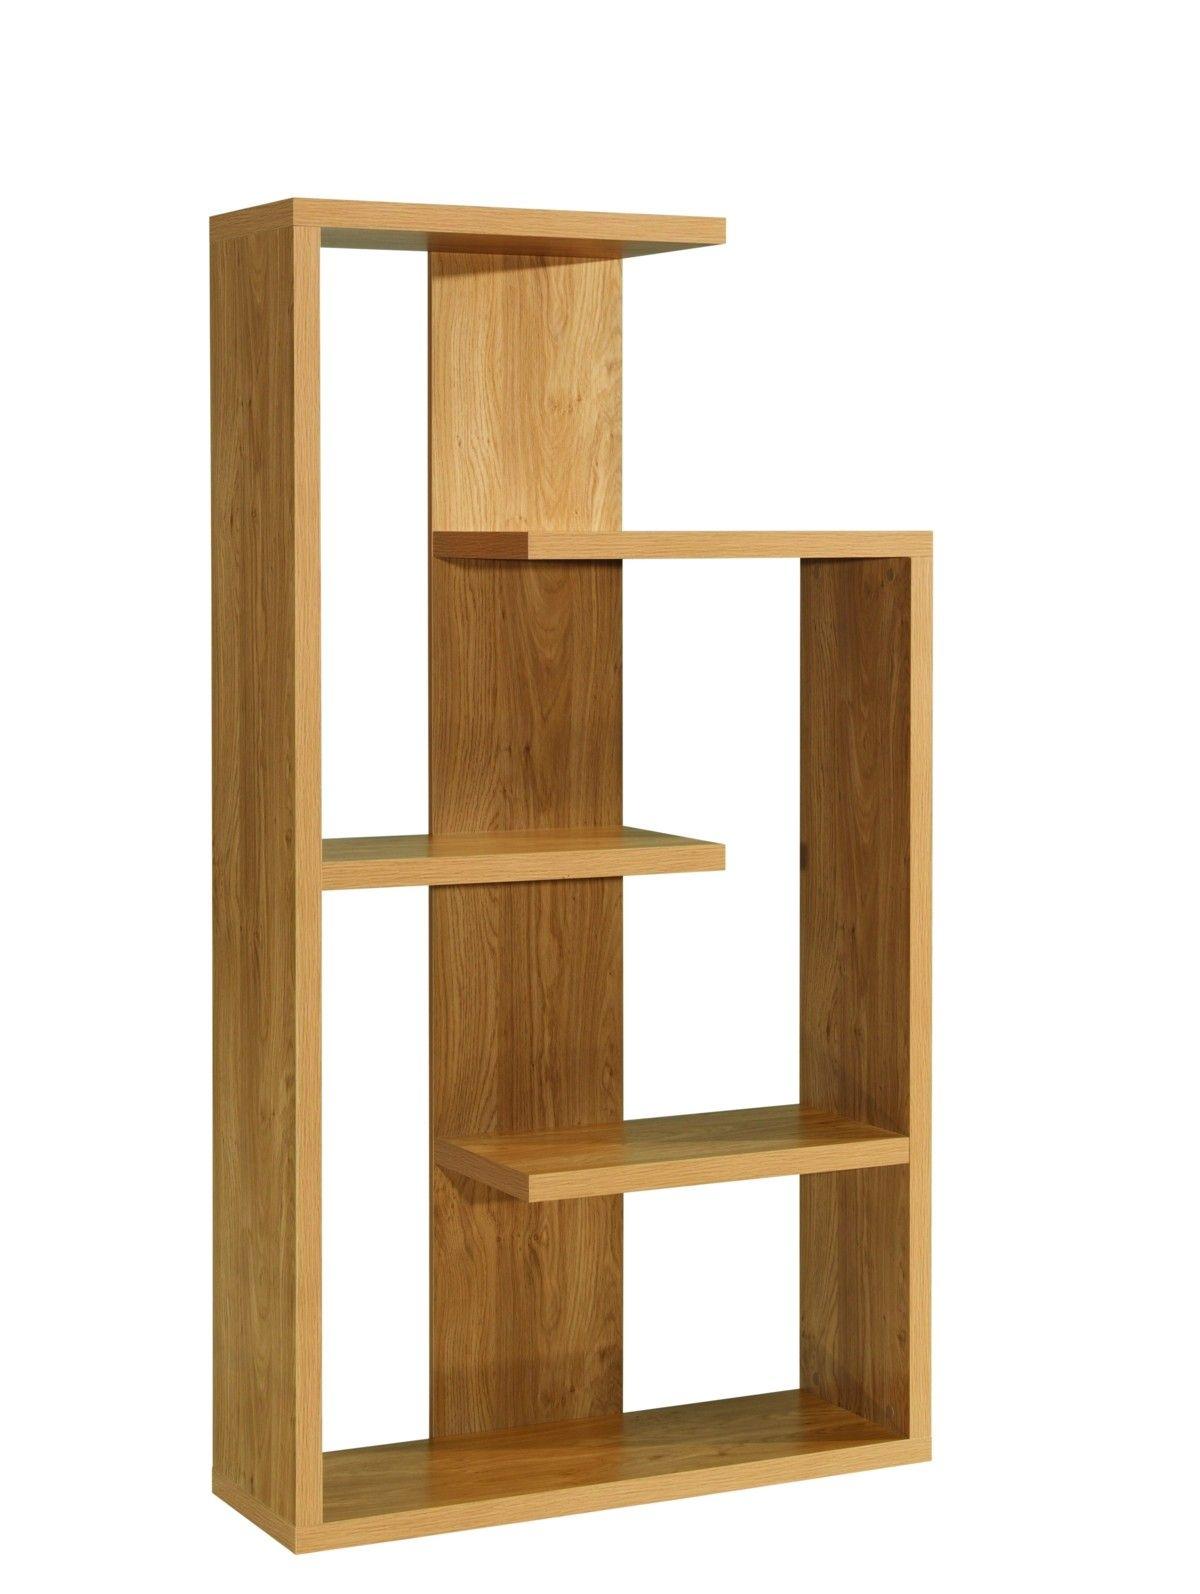 Bonsoni is proud to present this alberta display cabinet shelving